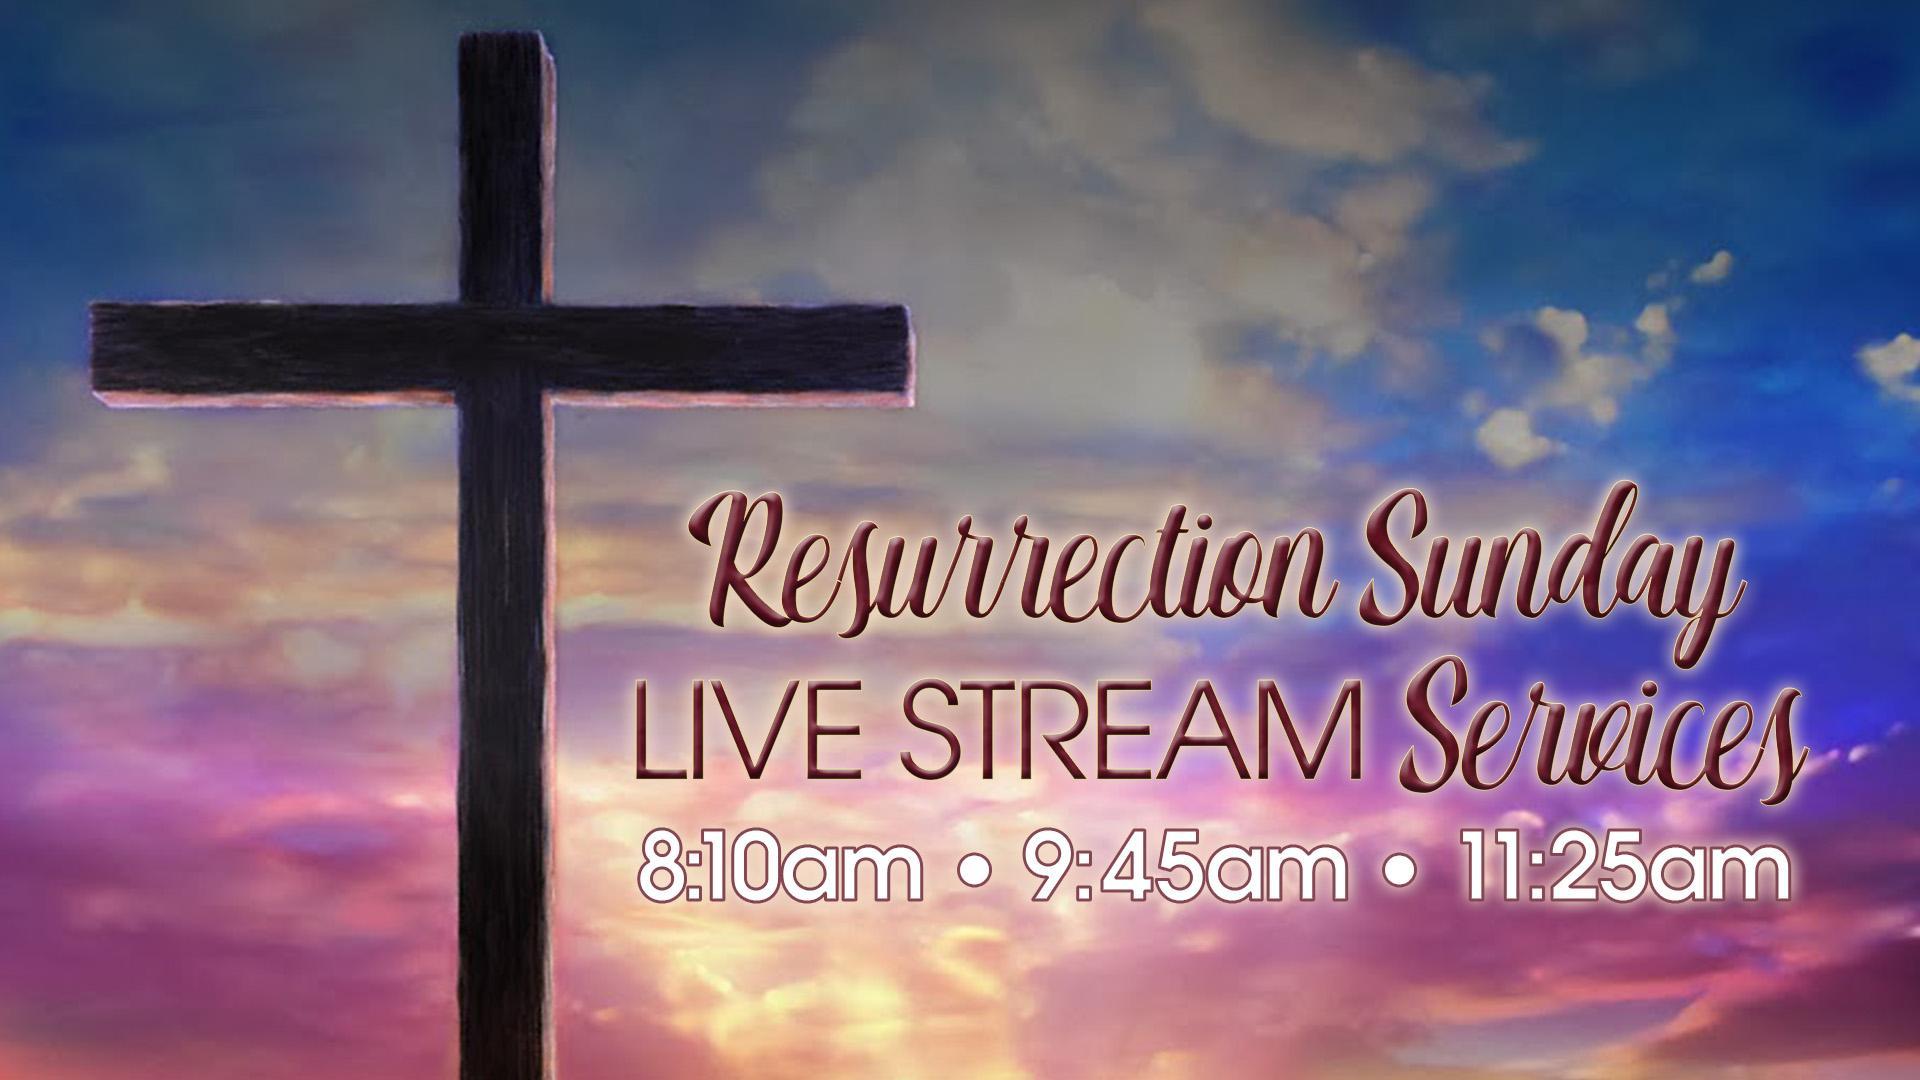 Resurrection Sunday Services Live Stream